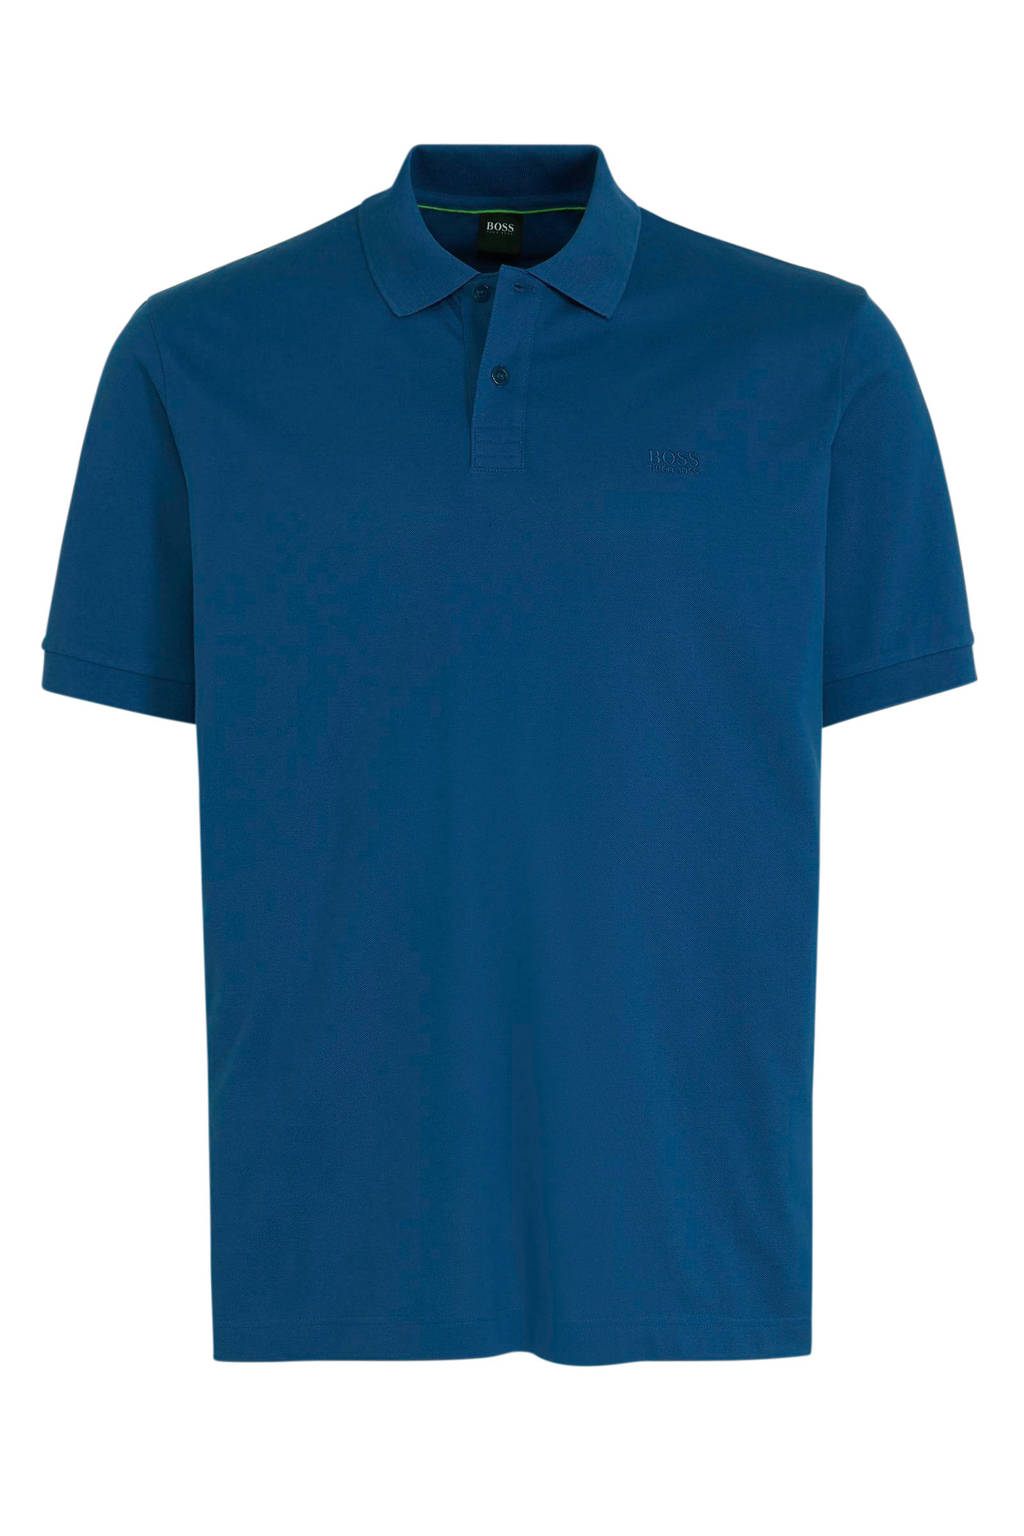 BOSS Athleisure Big & Tall regular fit polo met logo blauw, Blauw